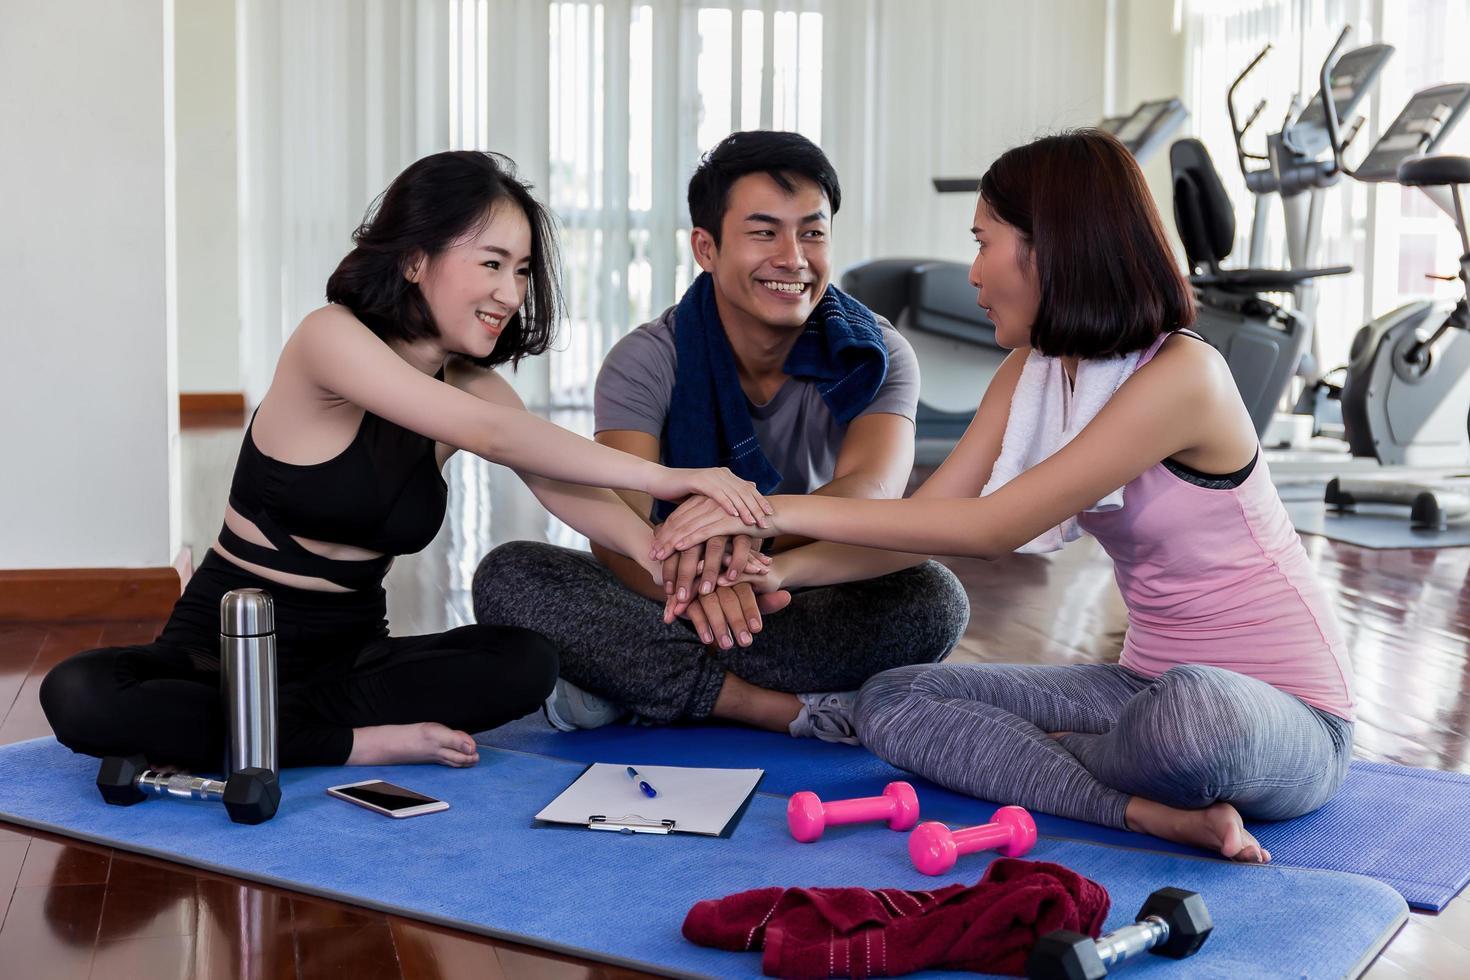 trois adultes au gymnase photo